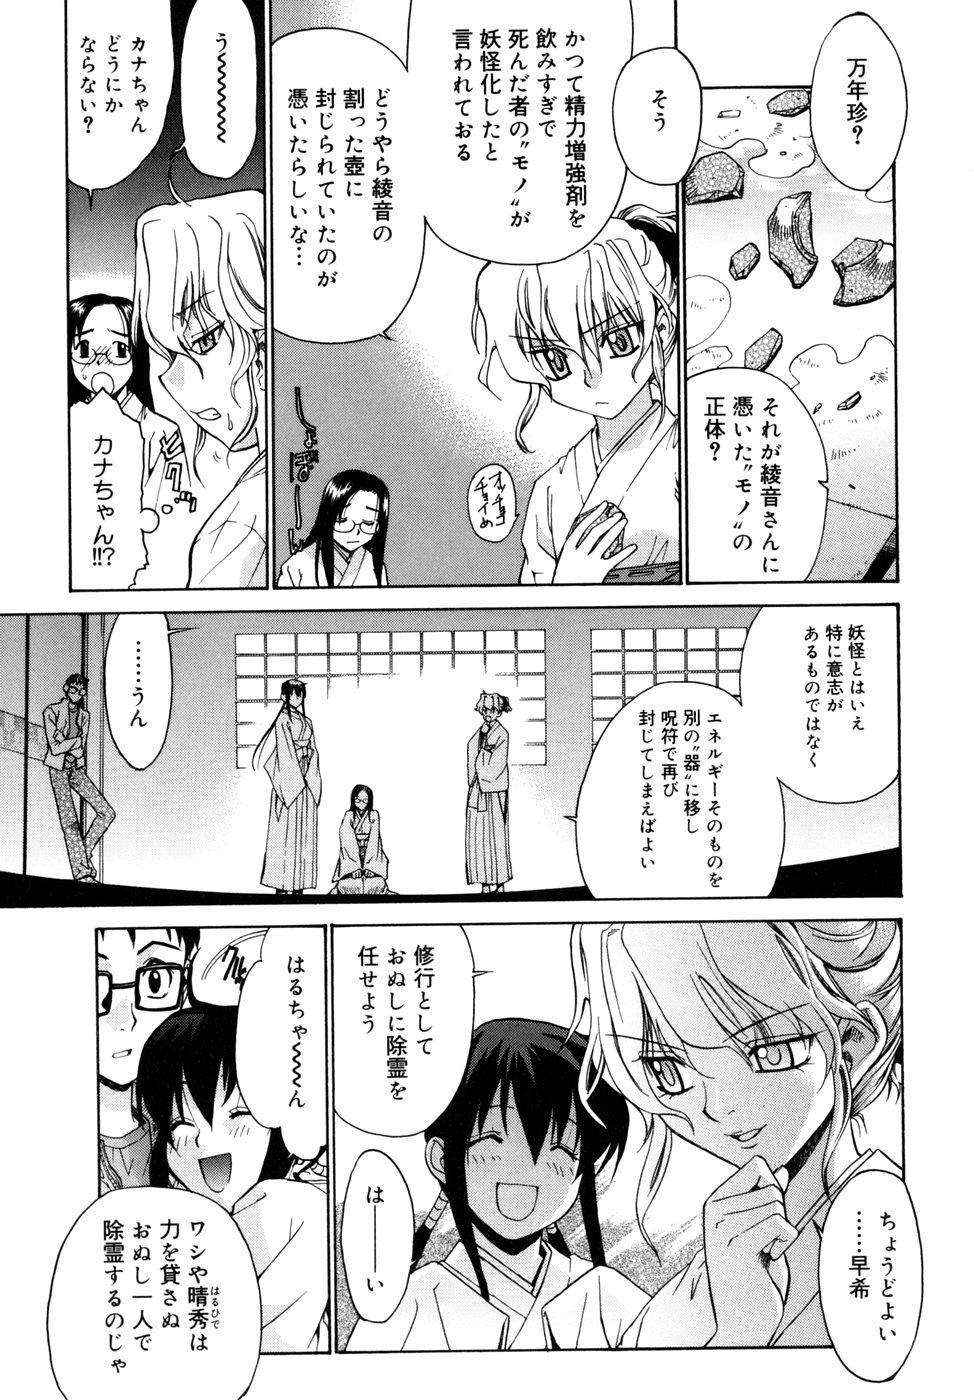 [Yaya Hinata] Tonari no Miko-san wa Minna Warau - The next shrine maidens smile in everyone. 64